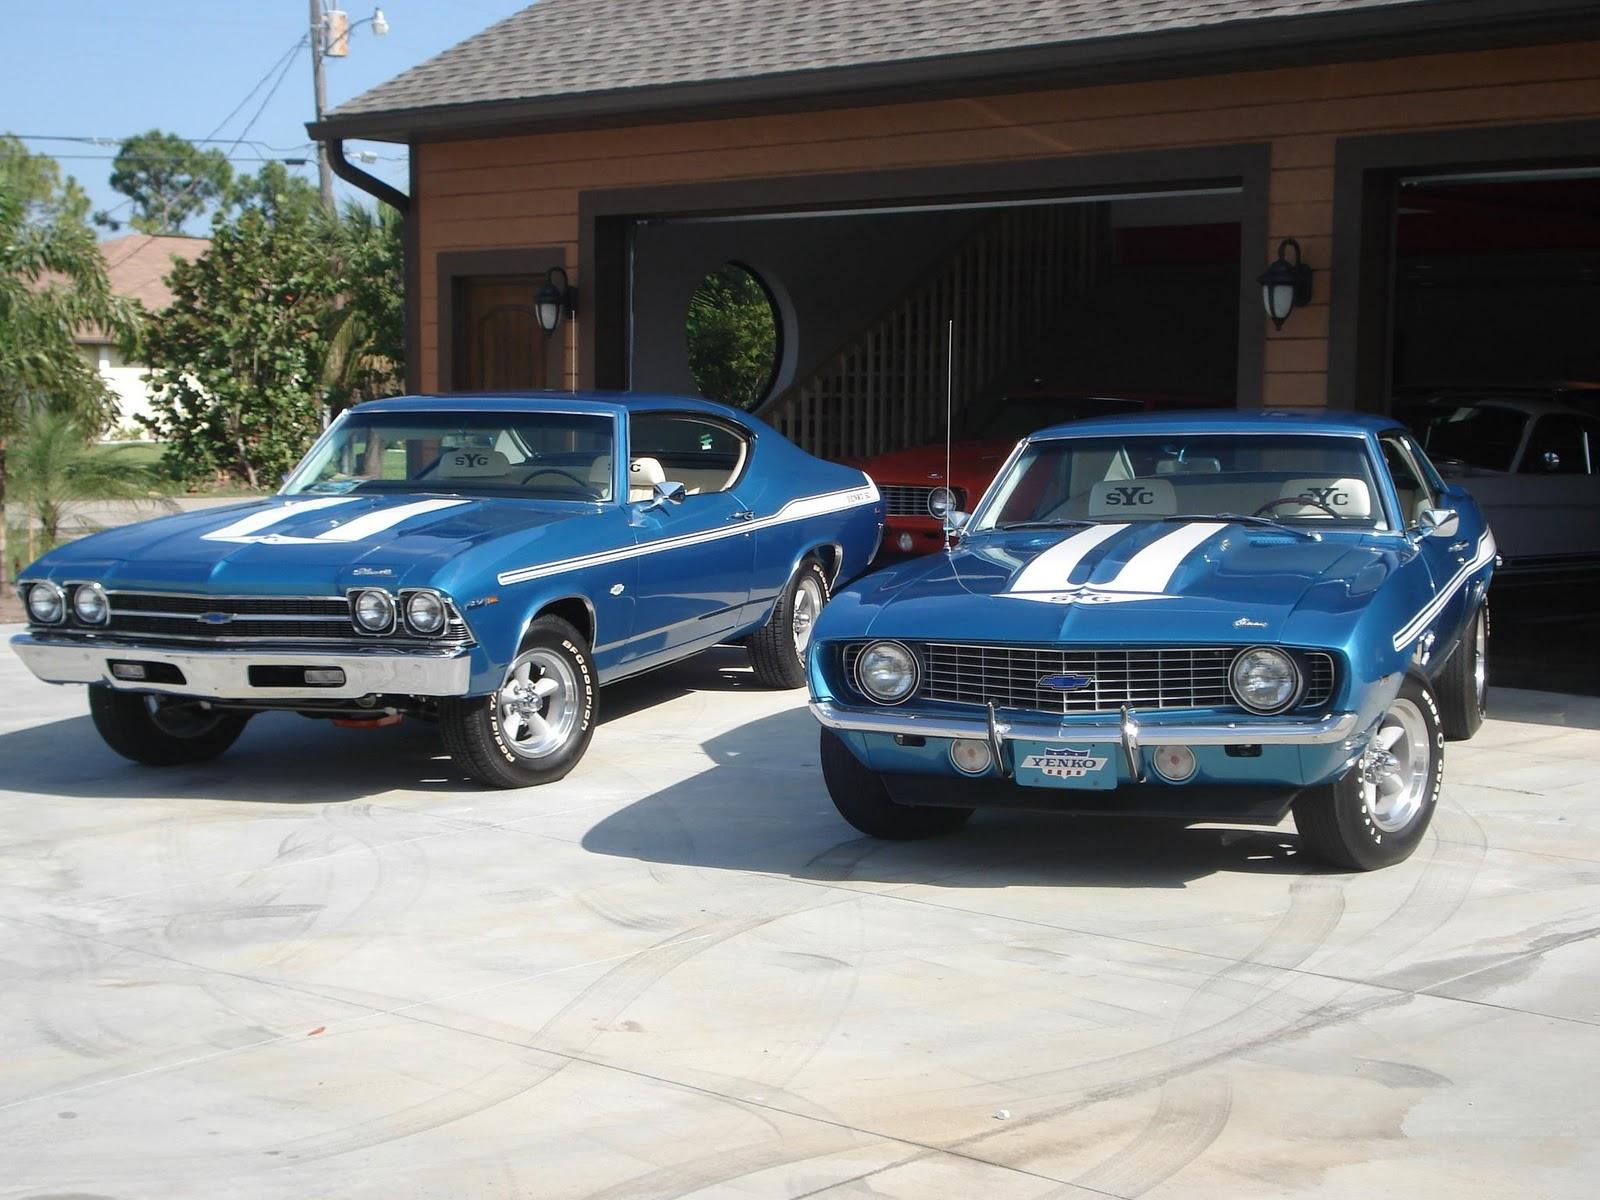 Cars Showroom: American Muscle cars